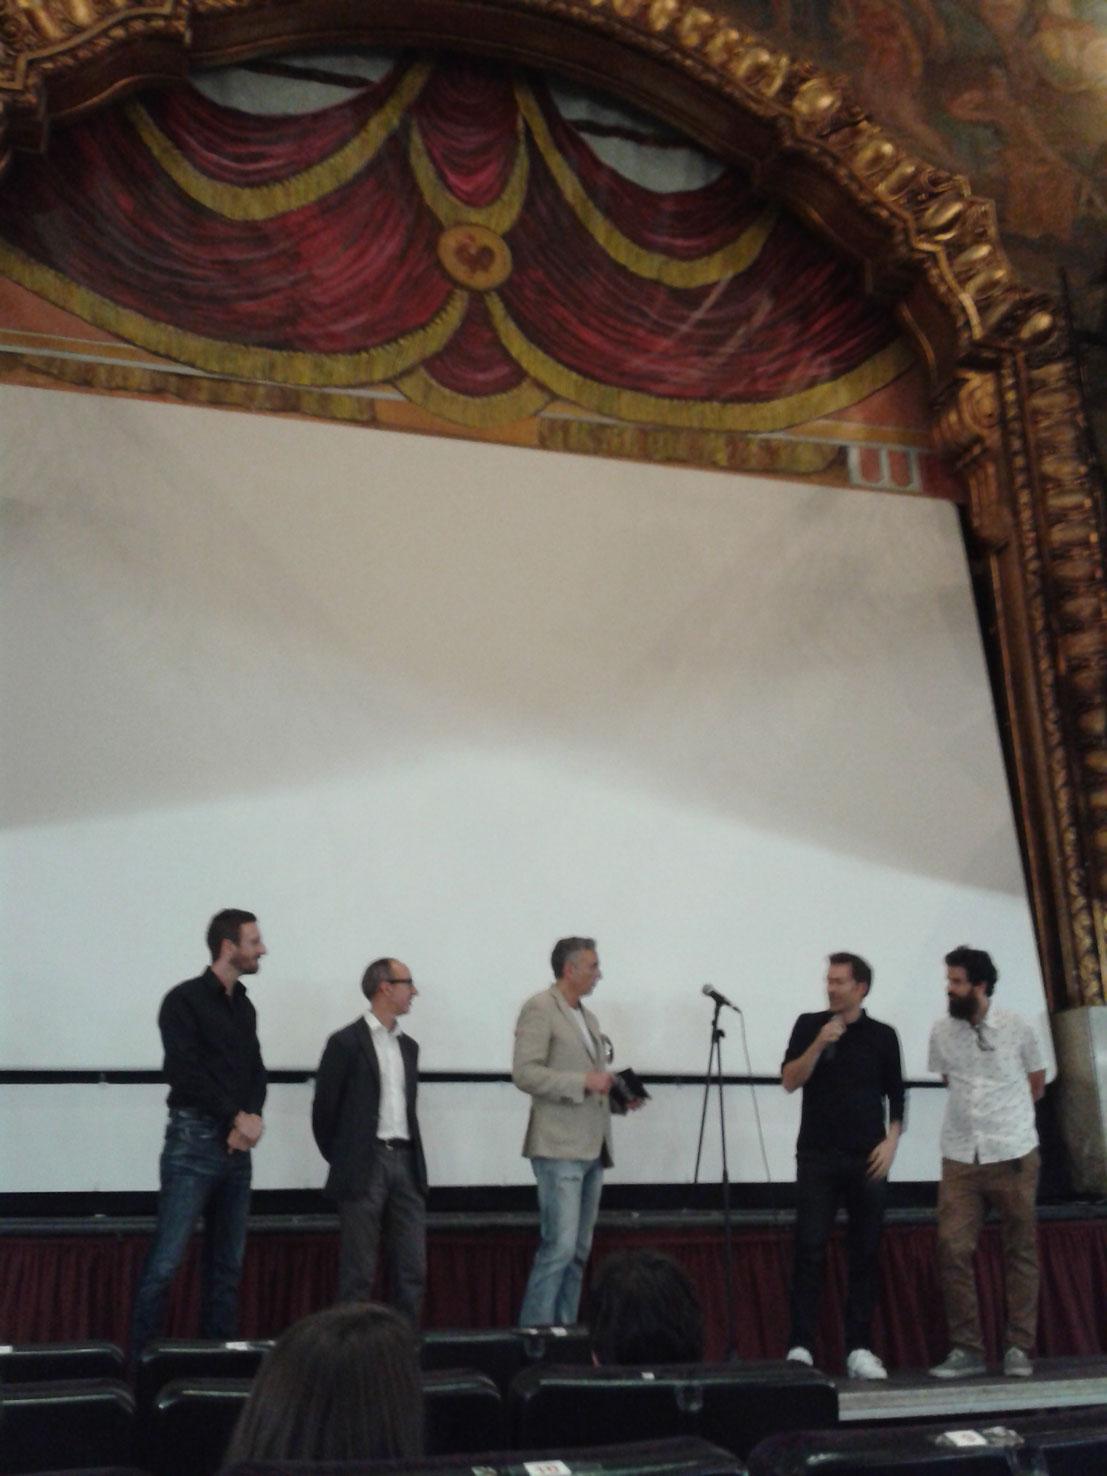 Nen Amagat al Festival Internacional de Cinema Fantàstic de Sitges 2016